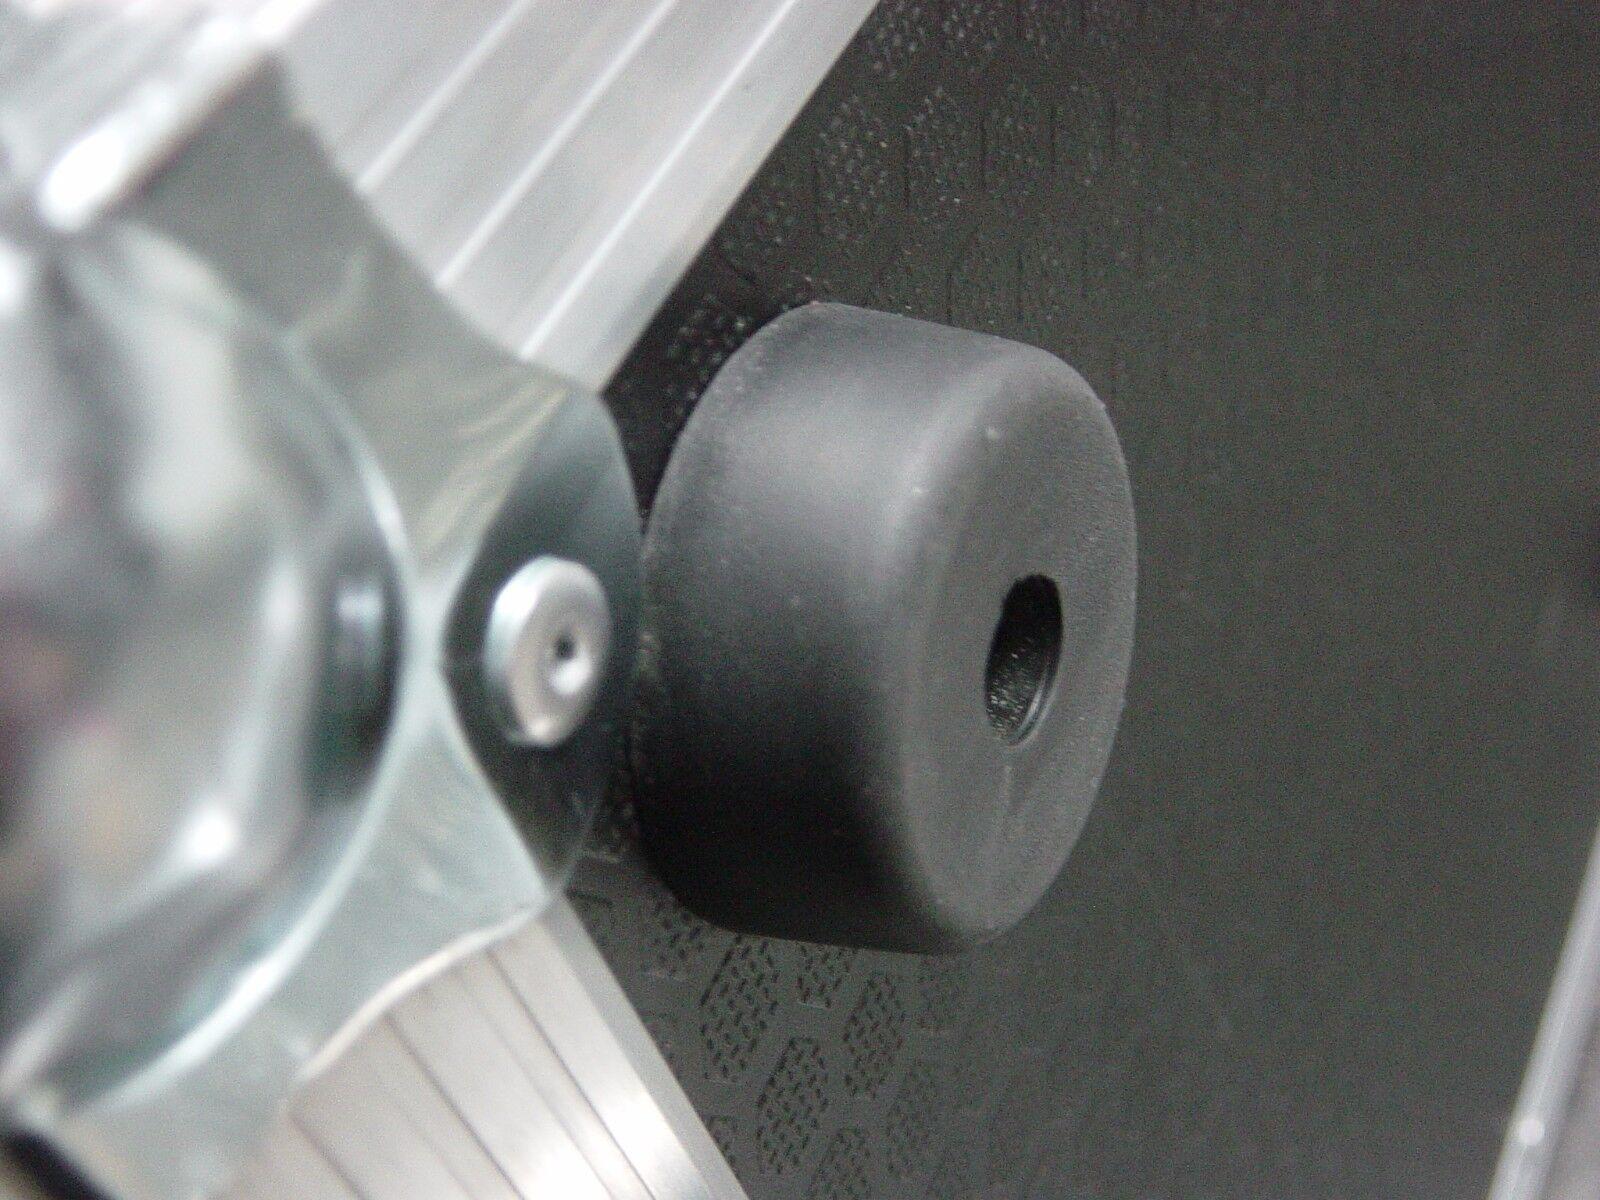 2U 19  Amp Amp Amp cisne de montaje en bastidor Manga Estuche de viaje para estudio instalar (hex.) 28f0ef